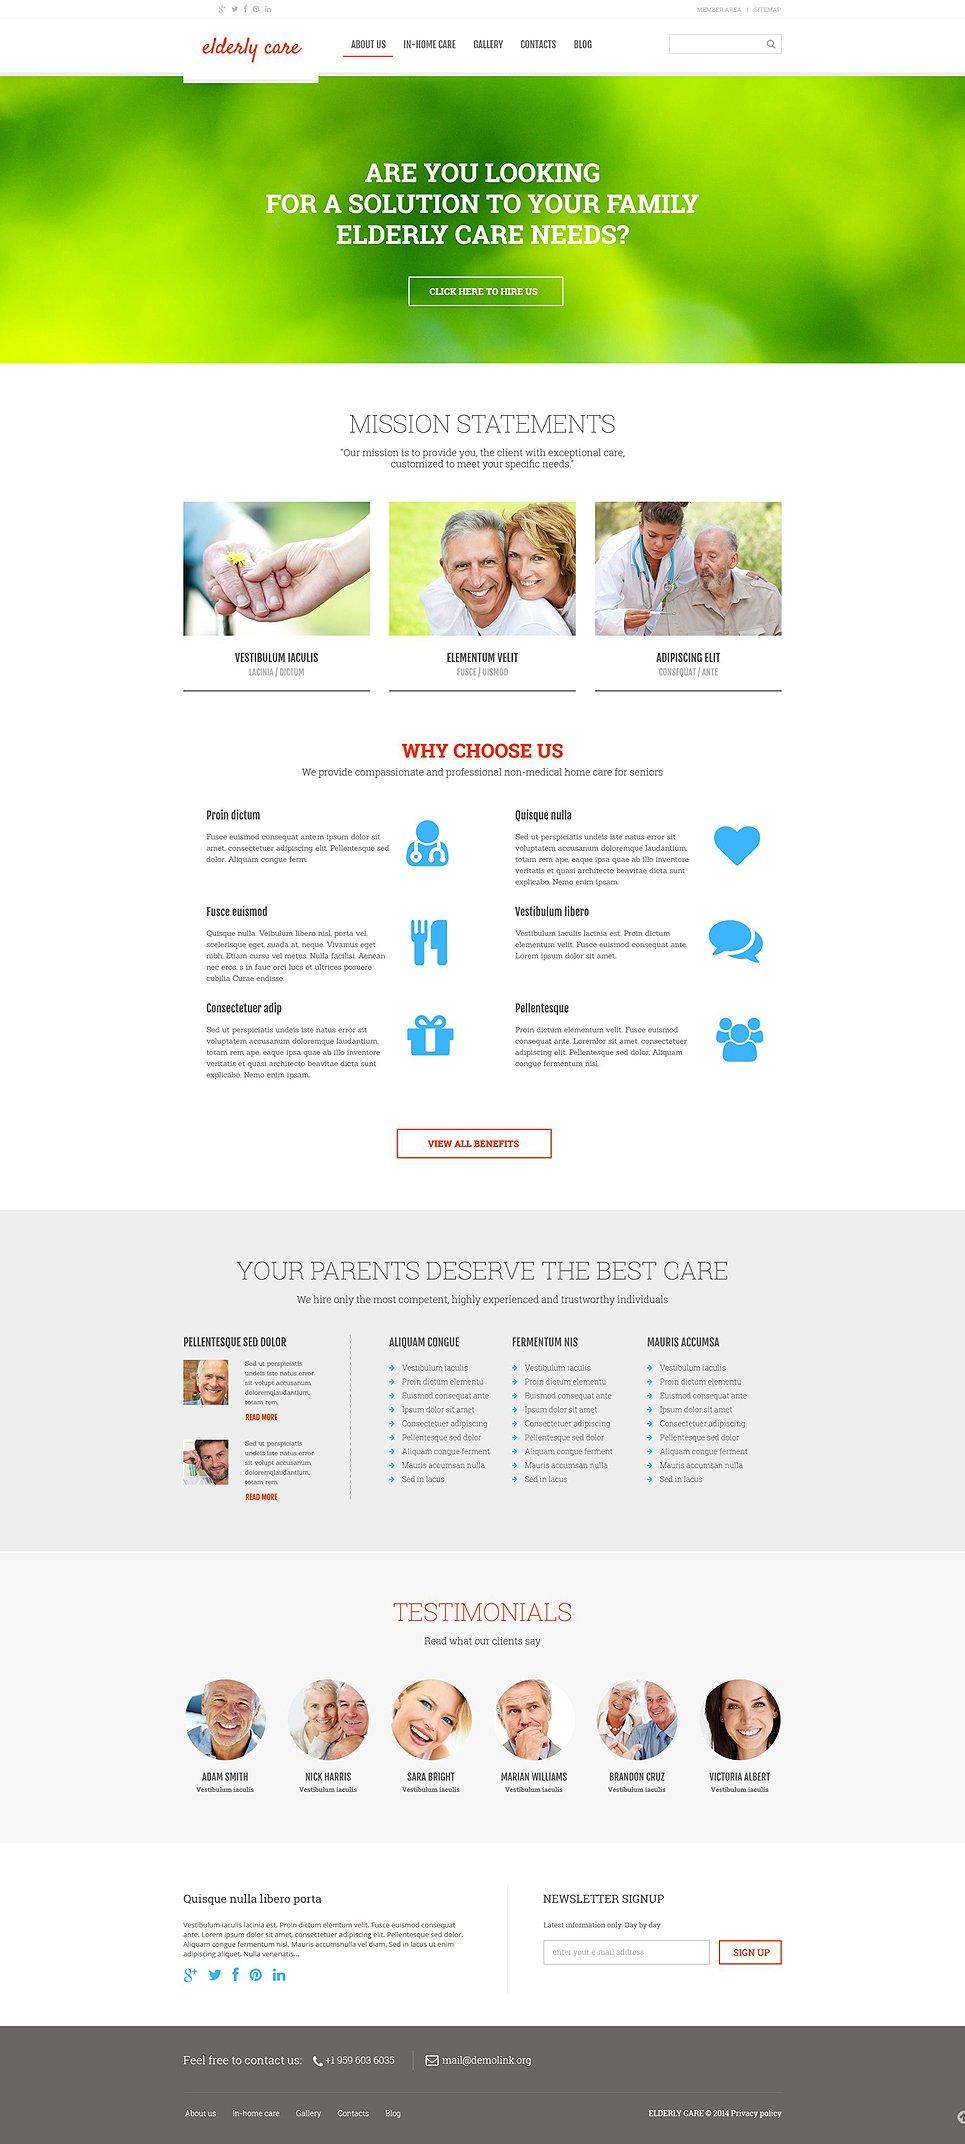 Адаптивный шаблон сайта на тему уход за престарелыми #52970